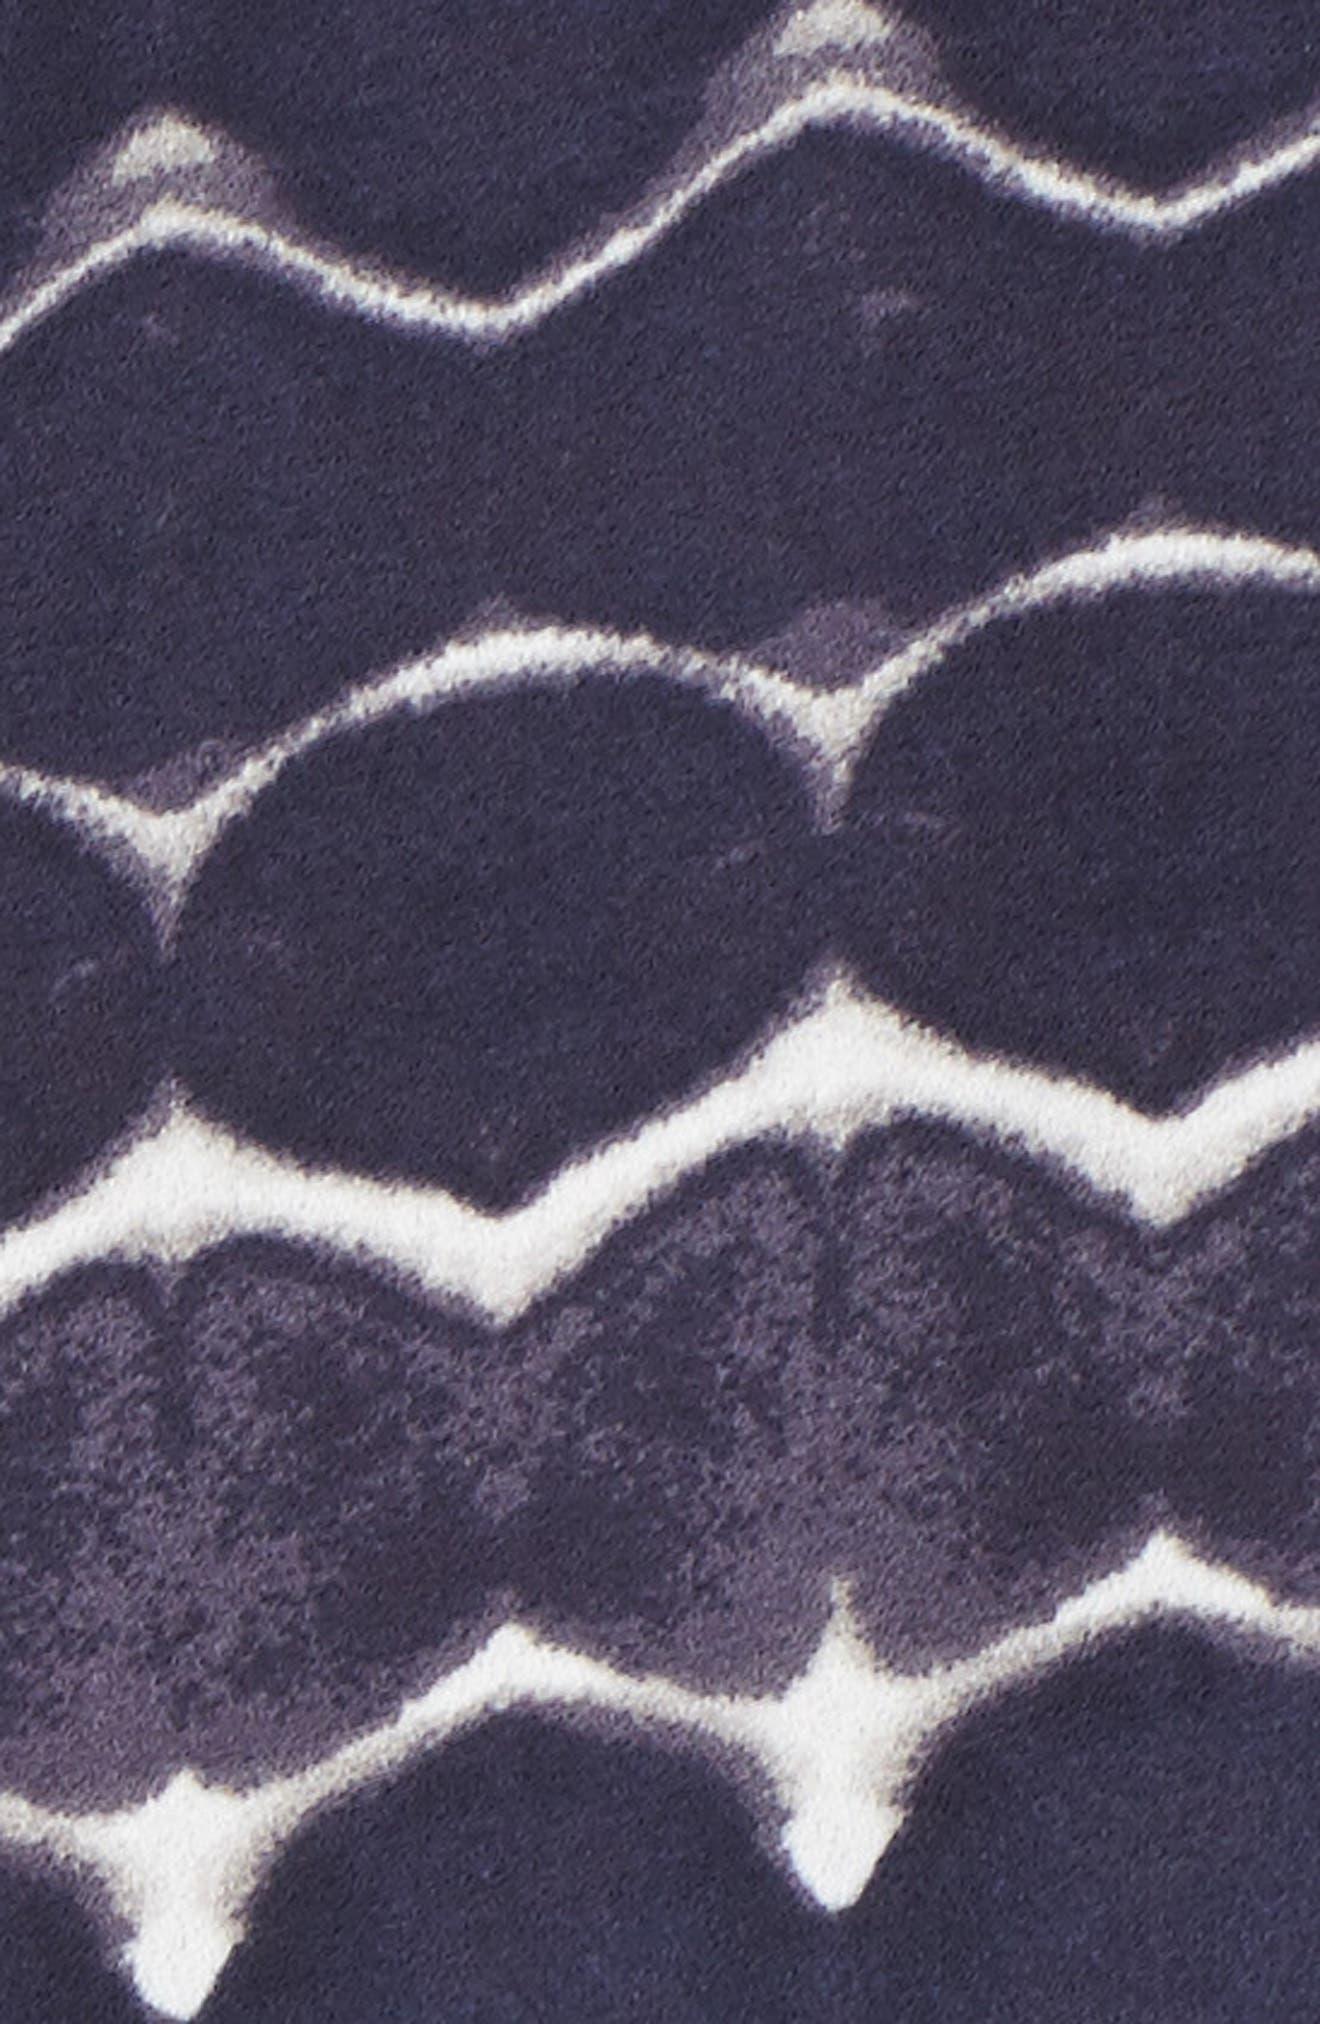 Drawstring Neck Crepe Top,                             Alternate thumbnail 5, color,                             Navy Peacoat Batik Spots